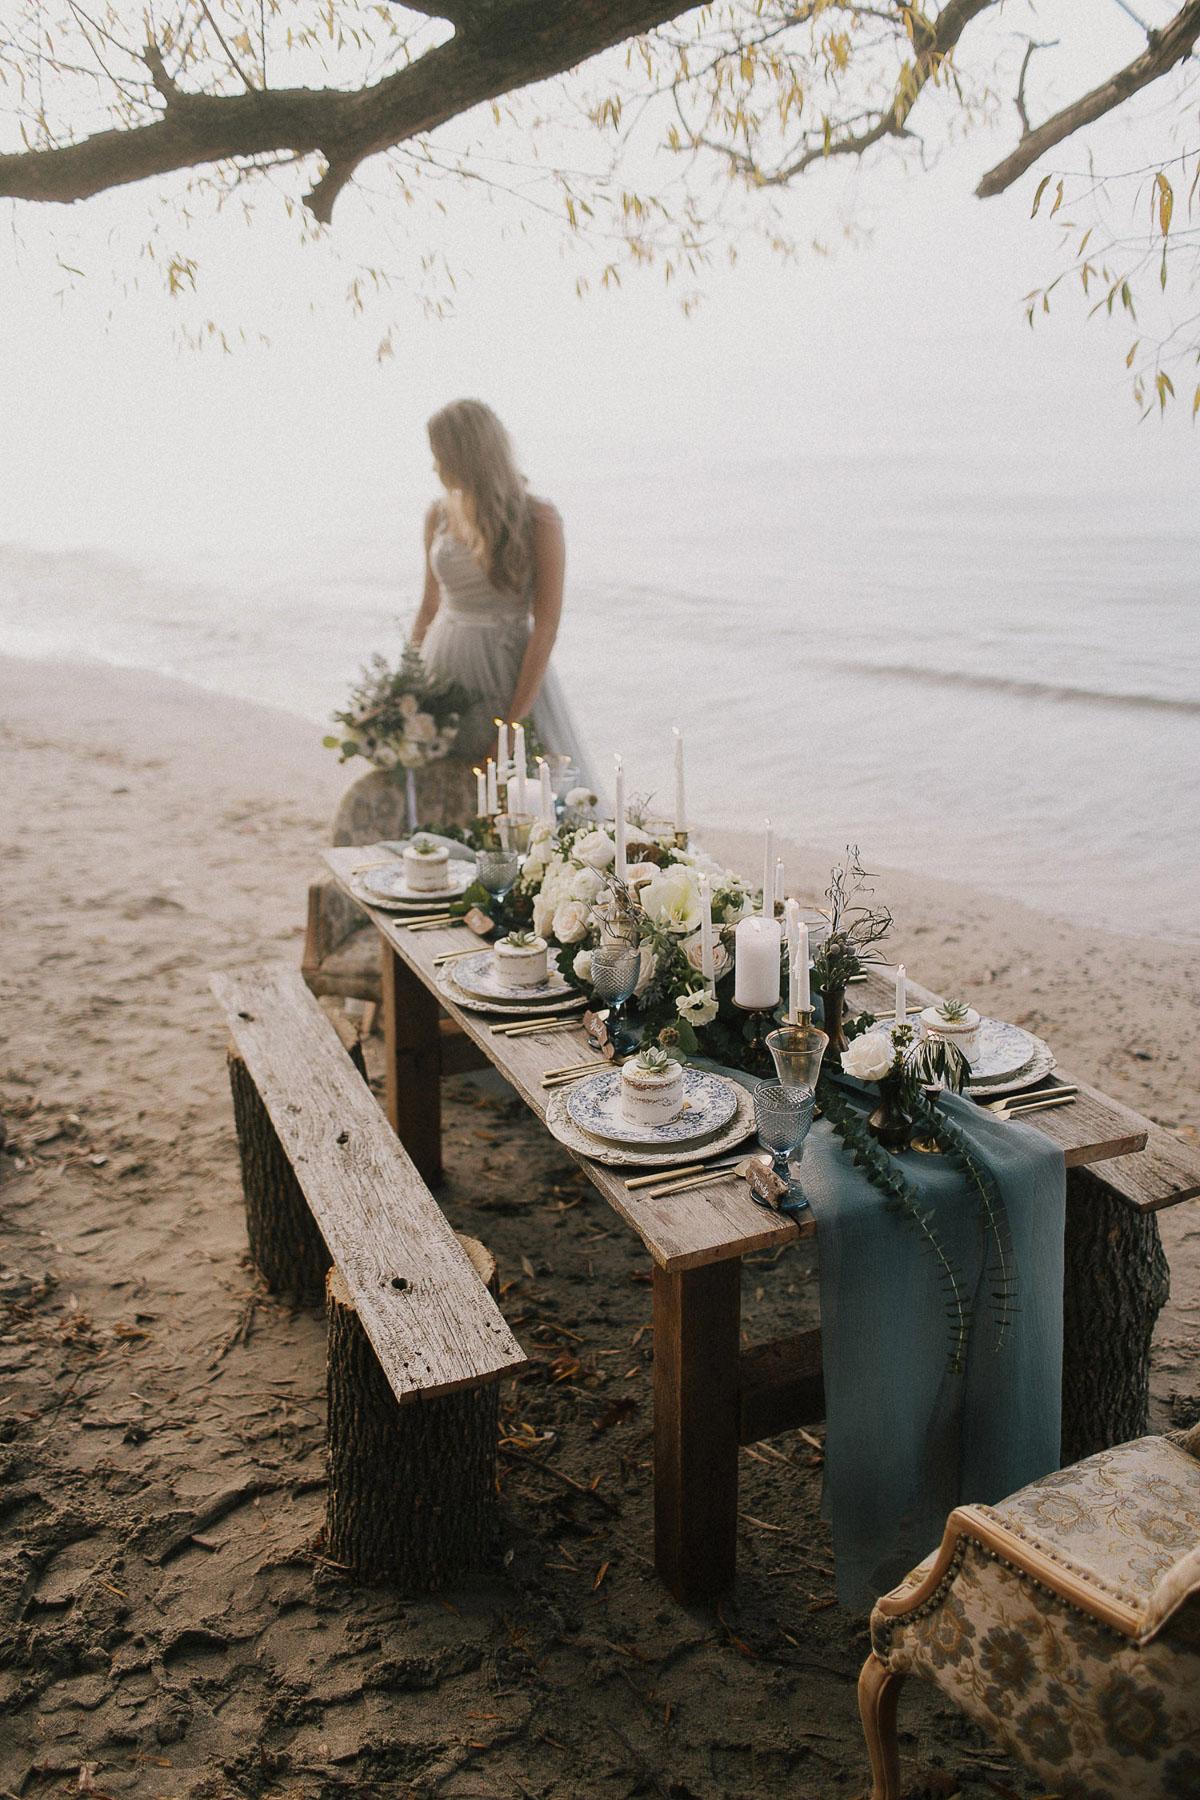 ballad-photography-vineyard-bride-swish-list-niagara-seaside-wedding-editorial-35.jpg